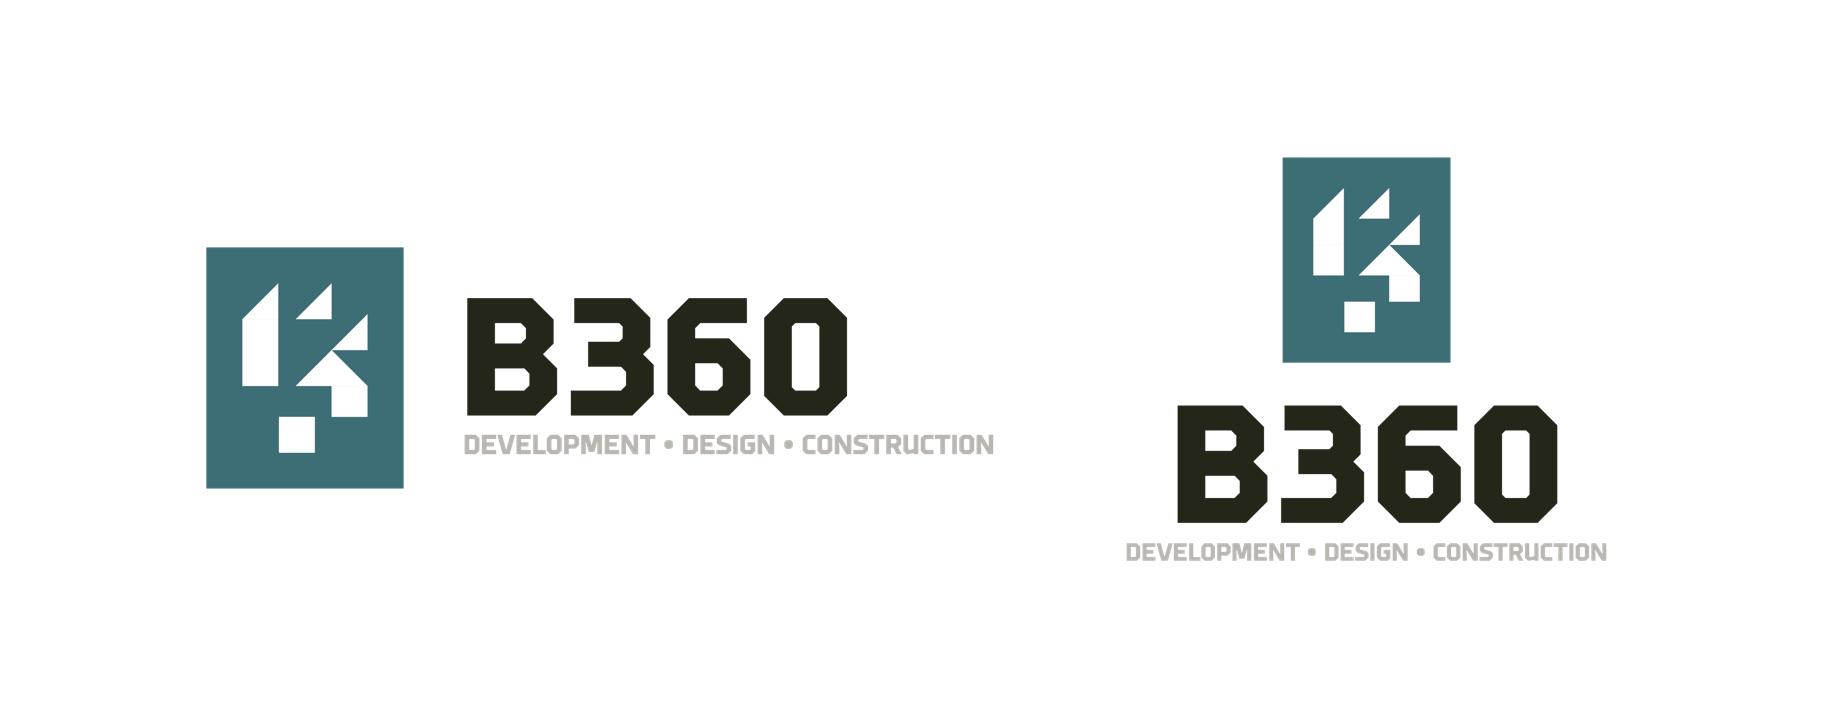 Redesigned 3360 Logo